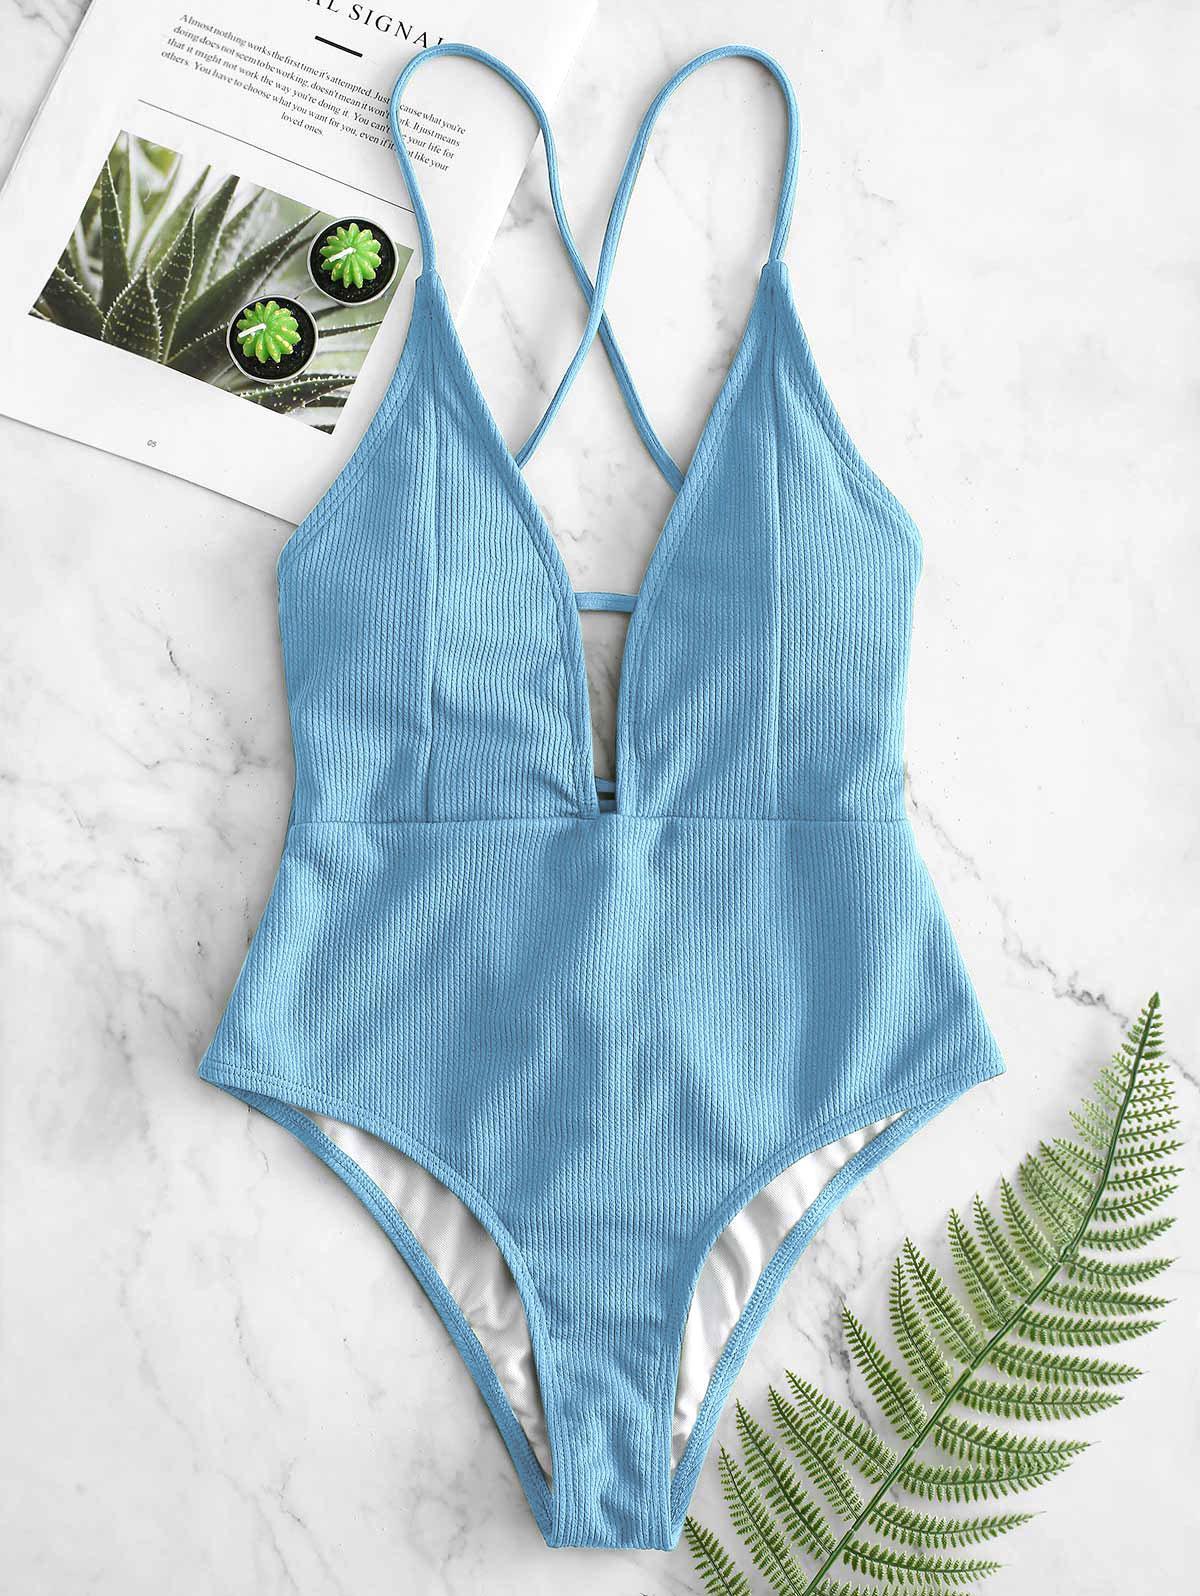 Zaful   LIGHT BLUE ZAFUL Lace-up Crisscross Ribbed Swimsuit   Clouty